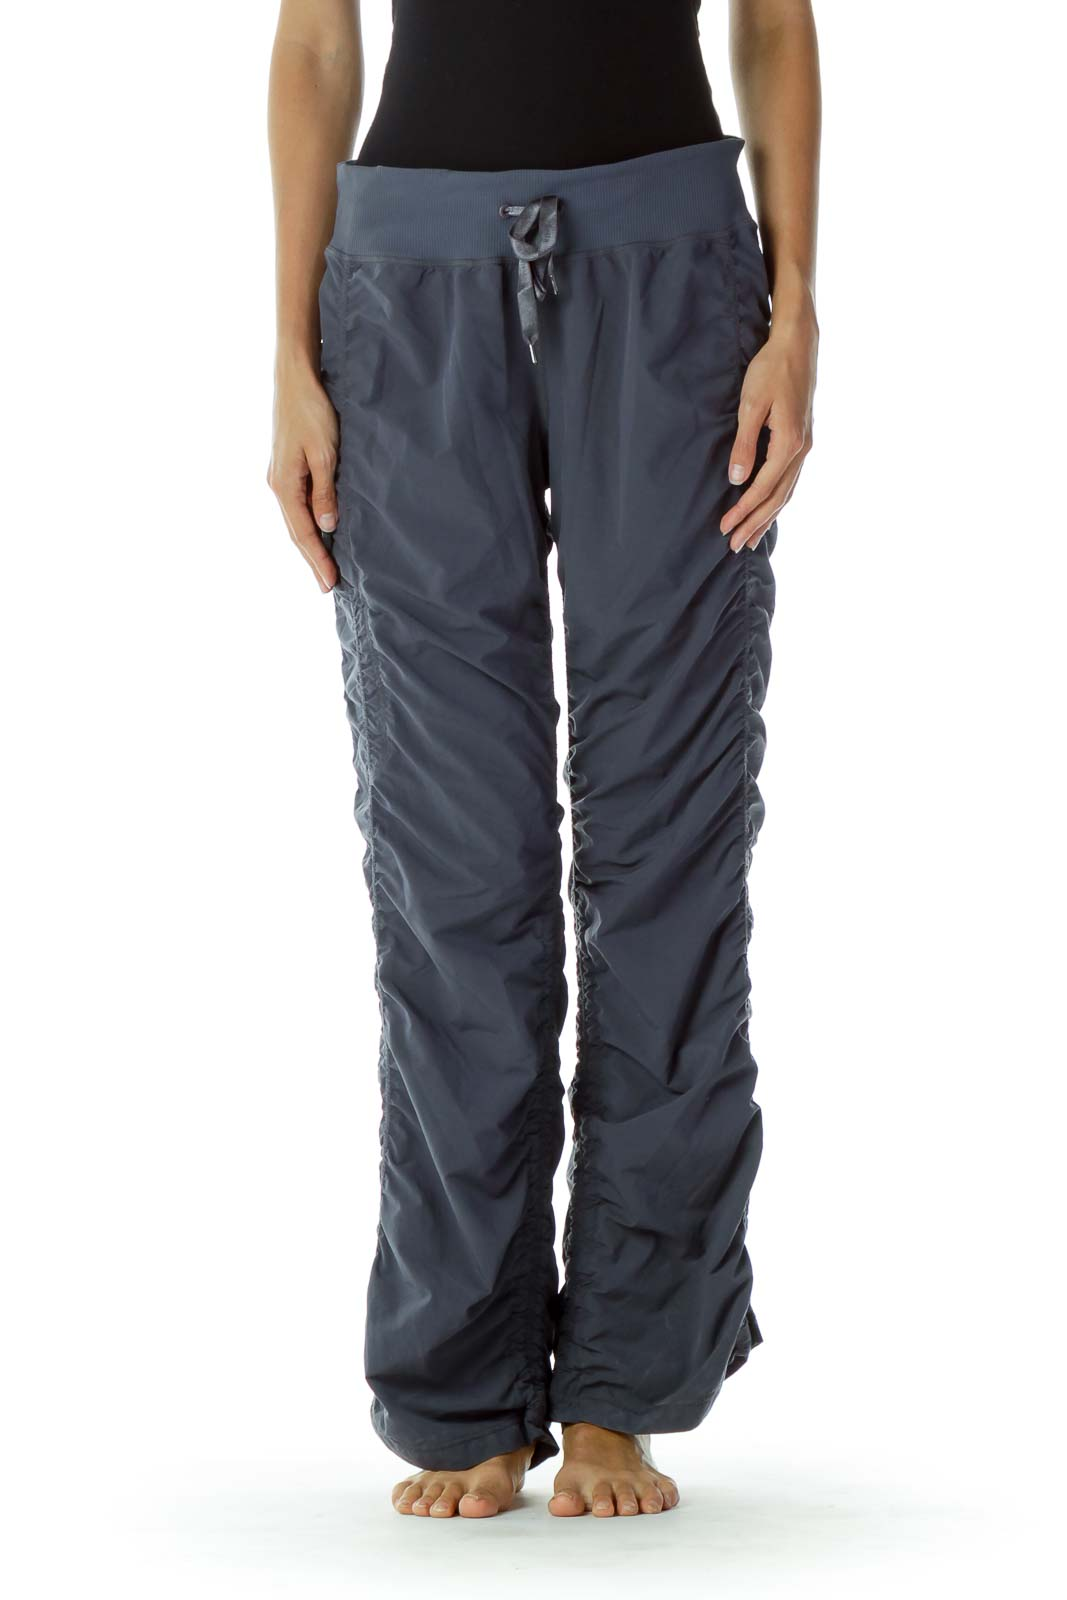 Blue Scrunched Pants